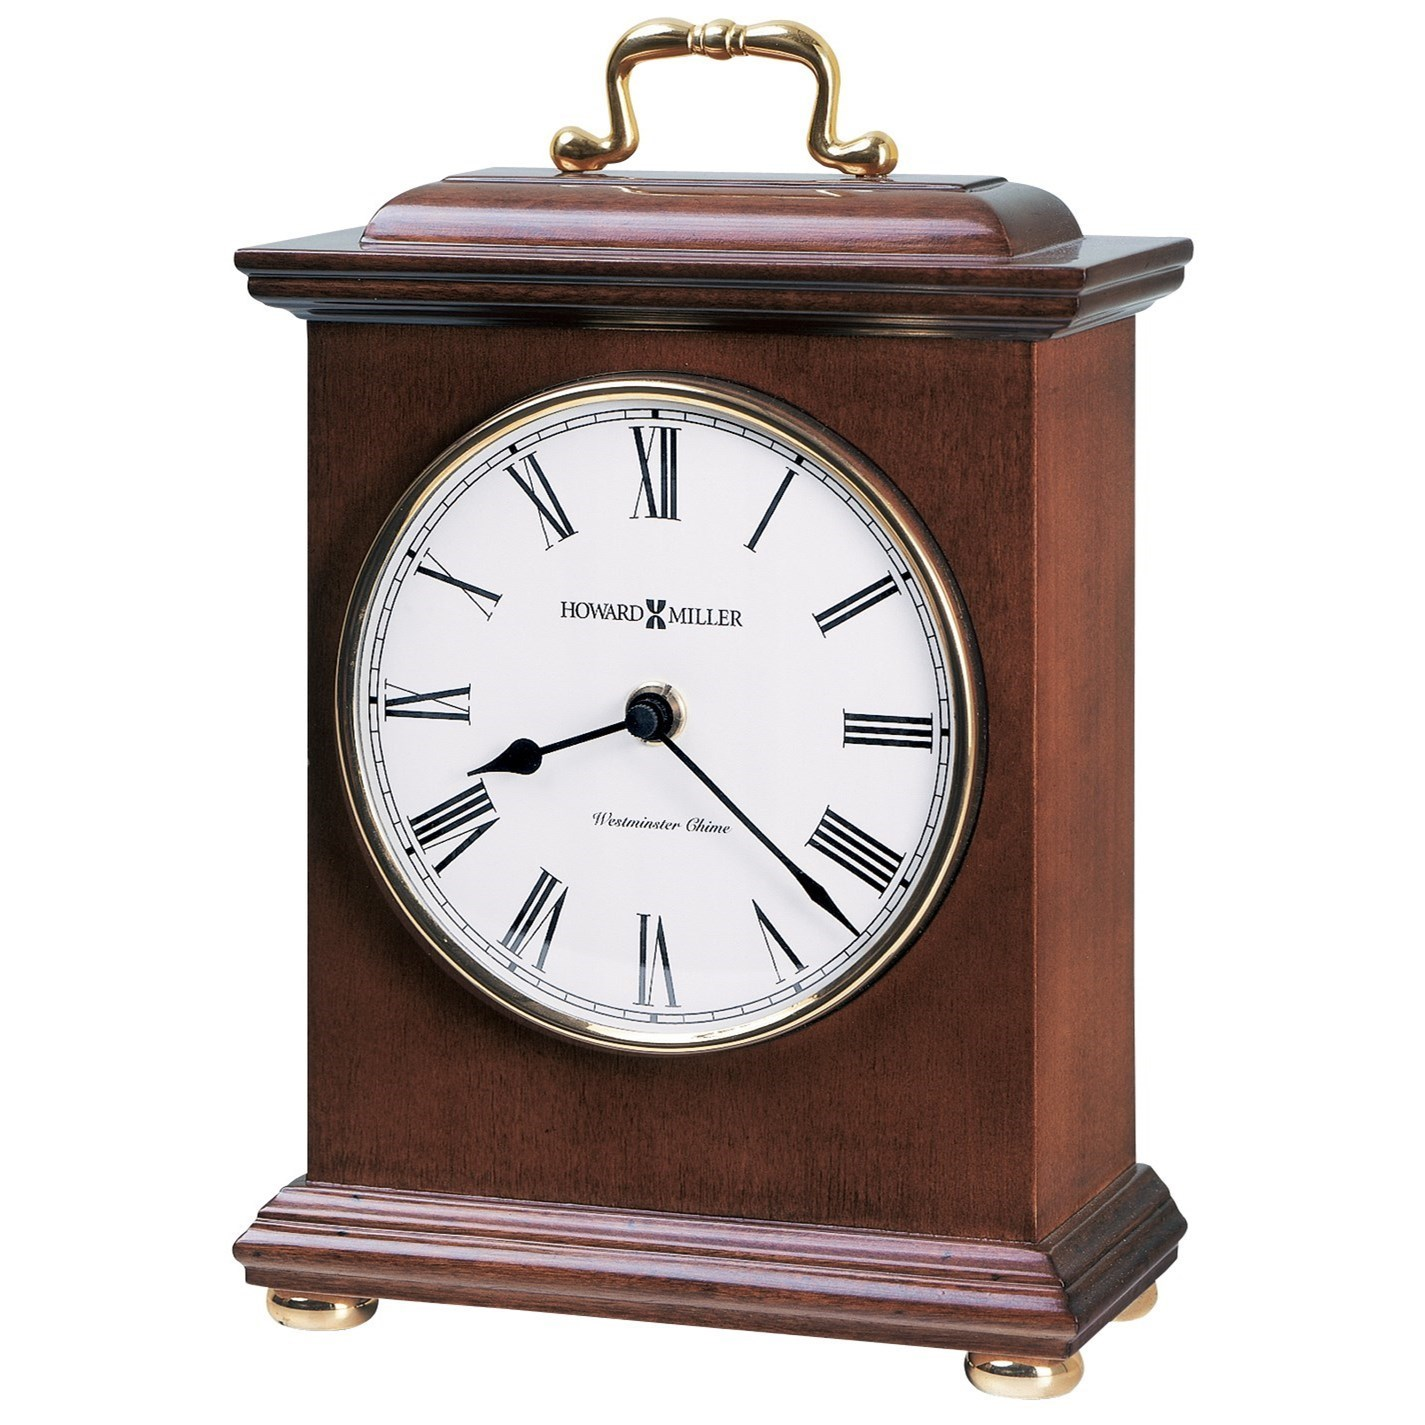 Howard Miller Table U0026 Mantel ClocksTara Mantle Clock